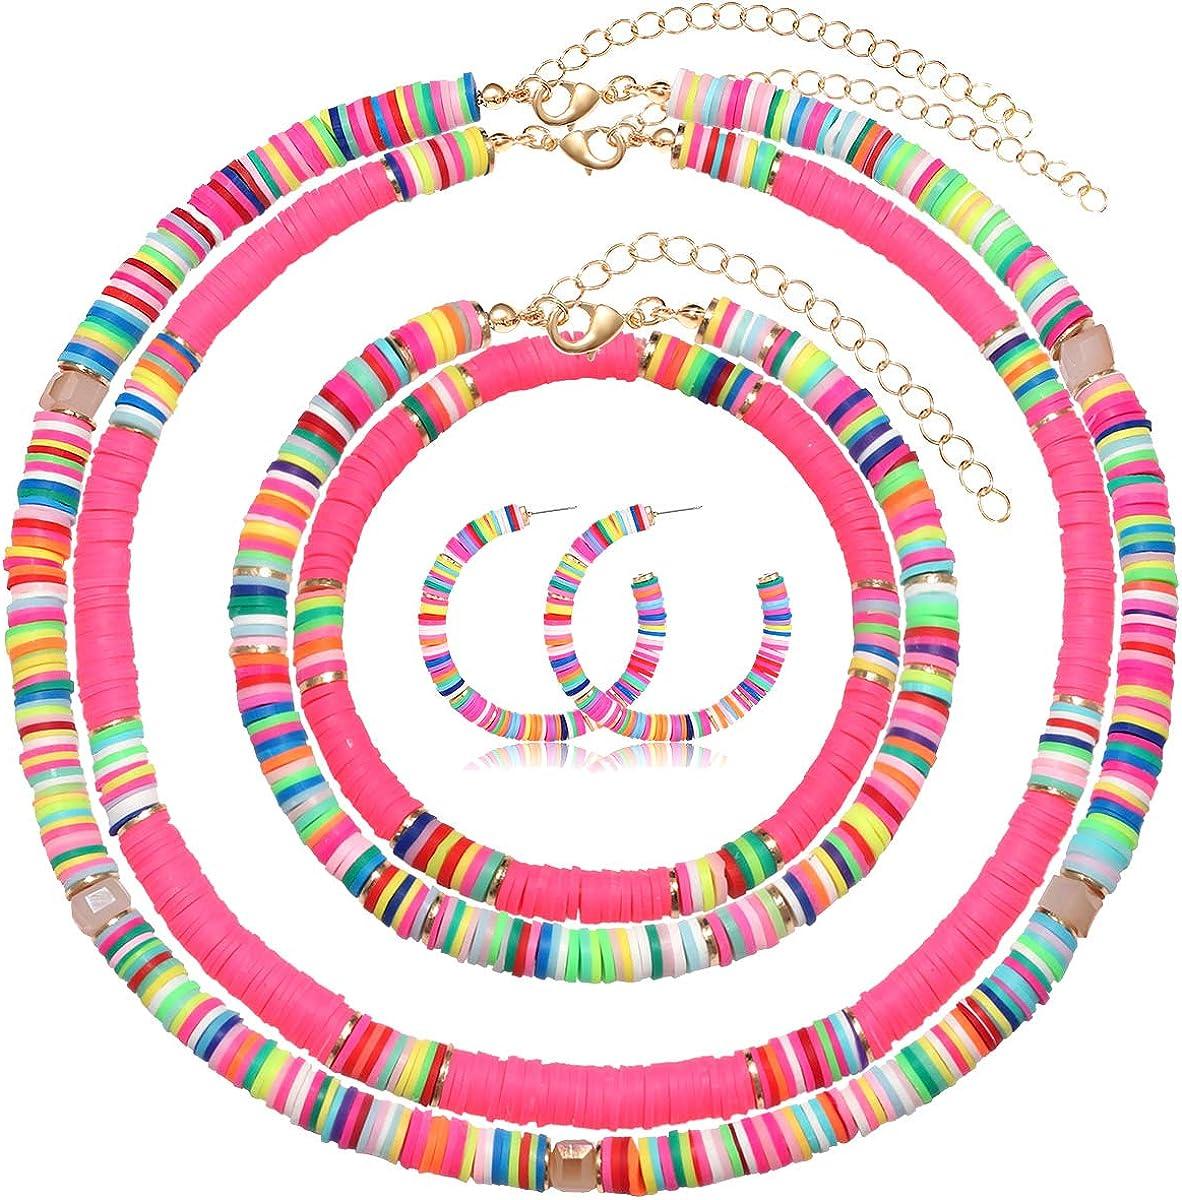 PHALIN Heishi Surfer Choker Necklace Hoop Earrings Rainbow Bead Anklets Stretch Bracelet for Women Multicolored Vinyl Disc Bead Necklaces Circle Earrings Summer Beach Ankle Bracelet Jewelry Set